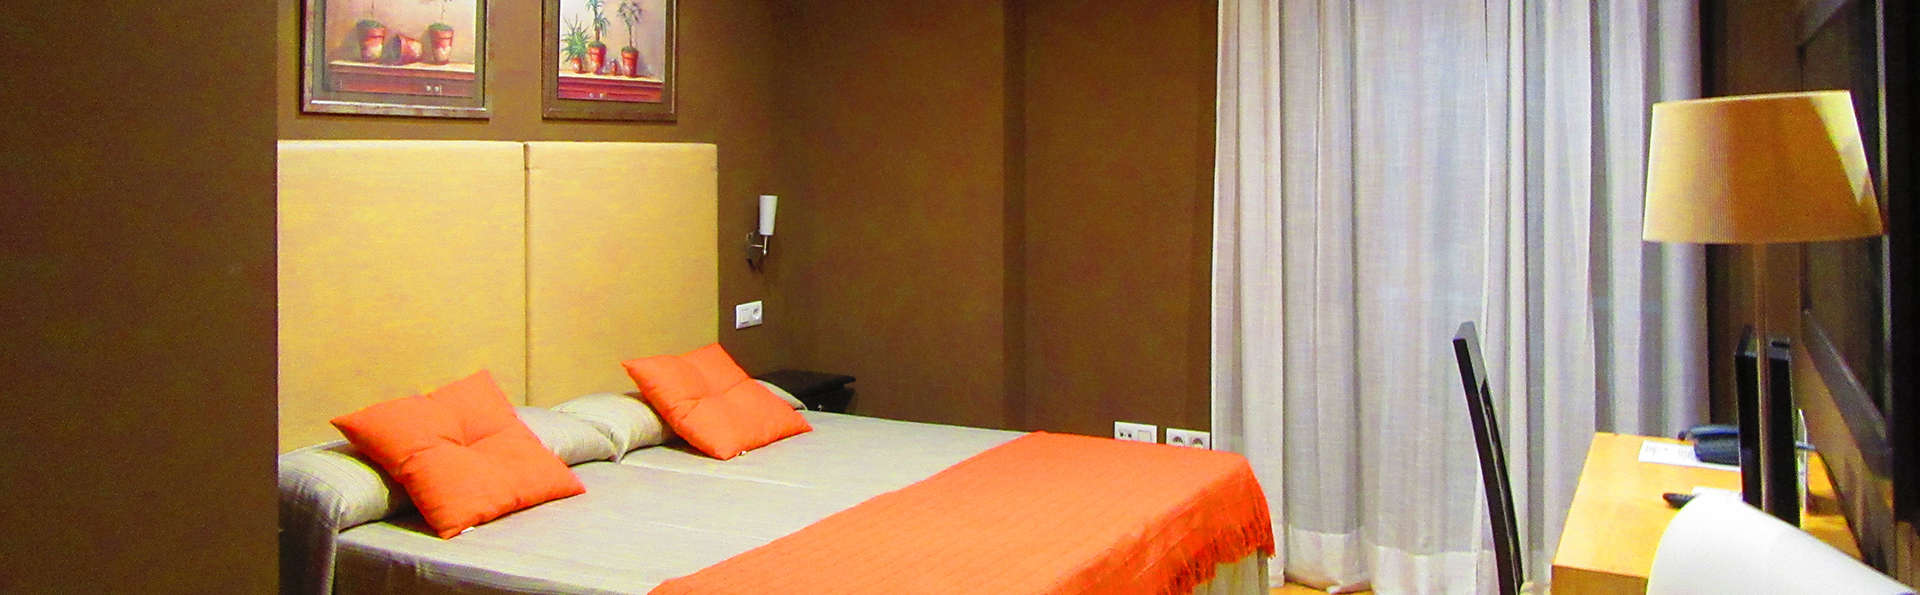 Hotel San Marcos - EDIT_NEW_Room4.jpg